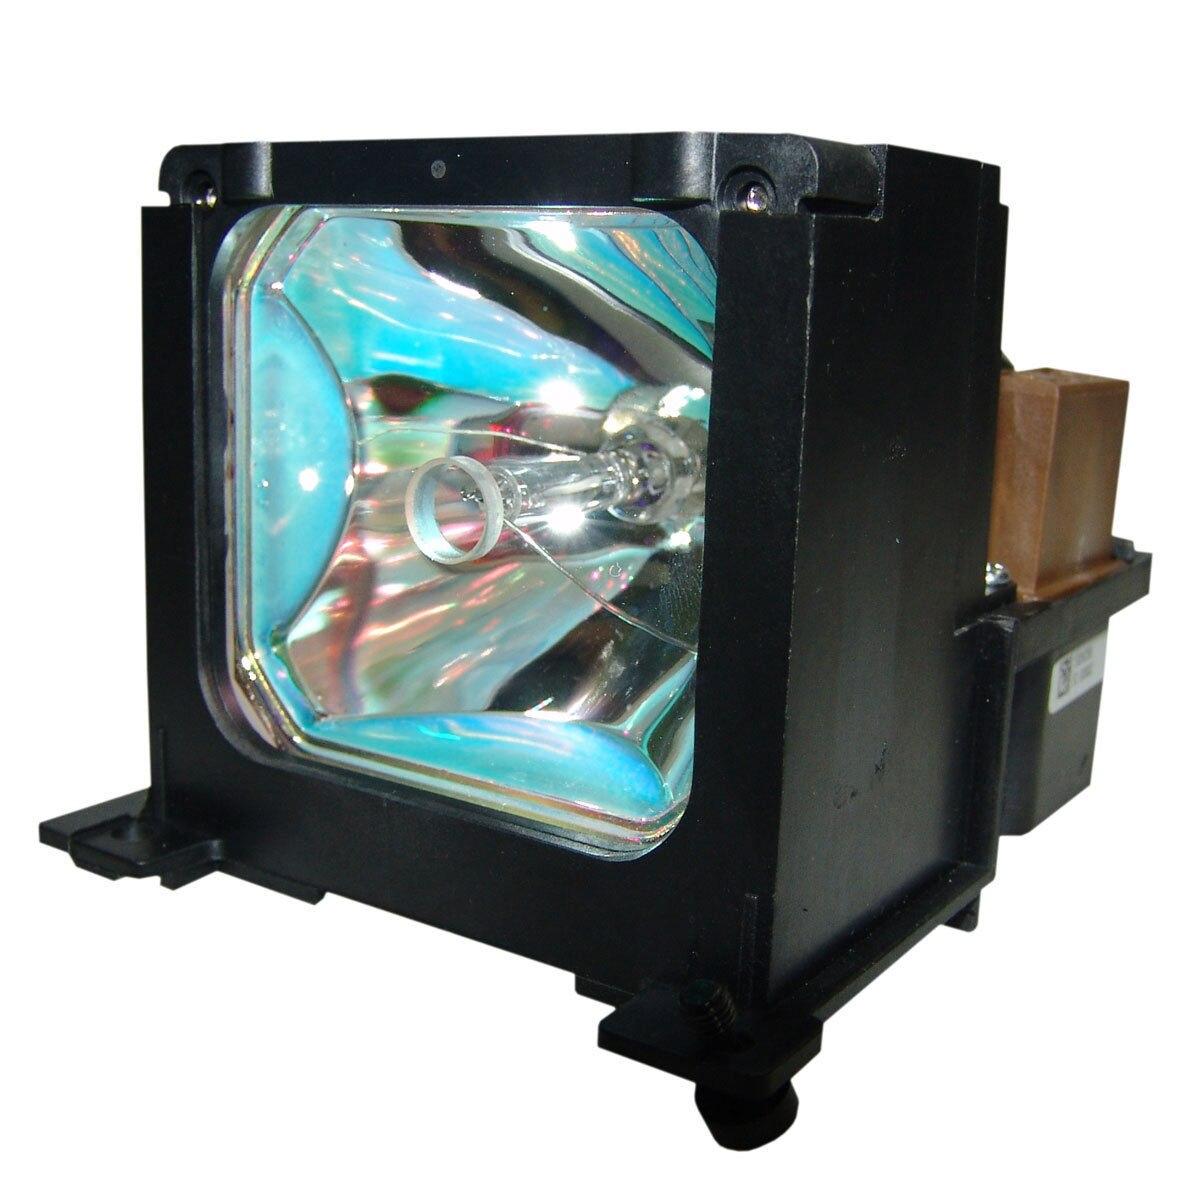 Projector Lamp Bulb VT40LP VT-40LP 50019497 for NEC VT440 VT440K VT450 VT540 VT540G VT540K with housing free shipping projector bulb lh01lp lh 01lp for nec ht510 ht410 projector lamp bulbs with housing free shipping